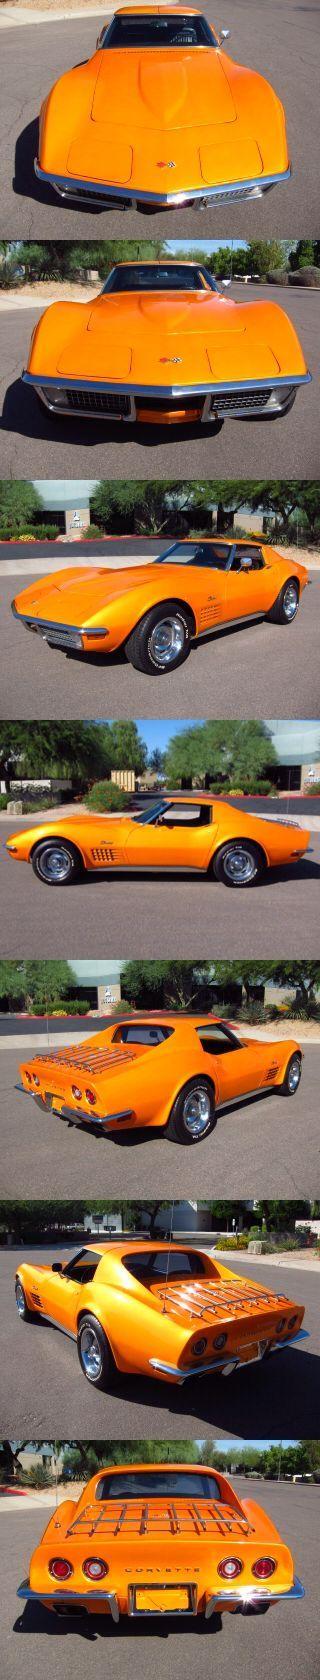 1970 Chevy Corvette #ClassicCars #CTins #Chevy